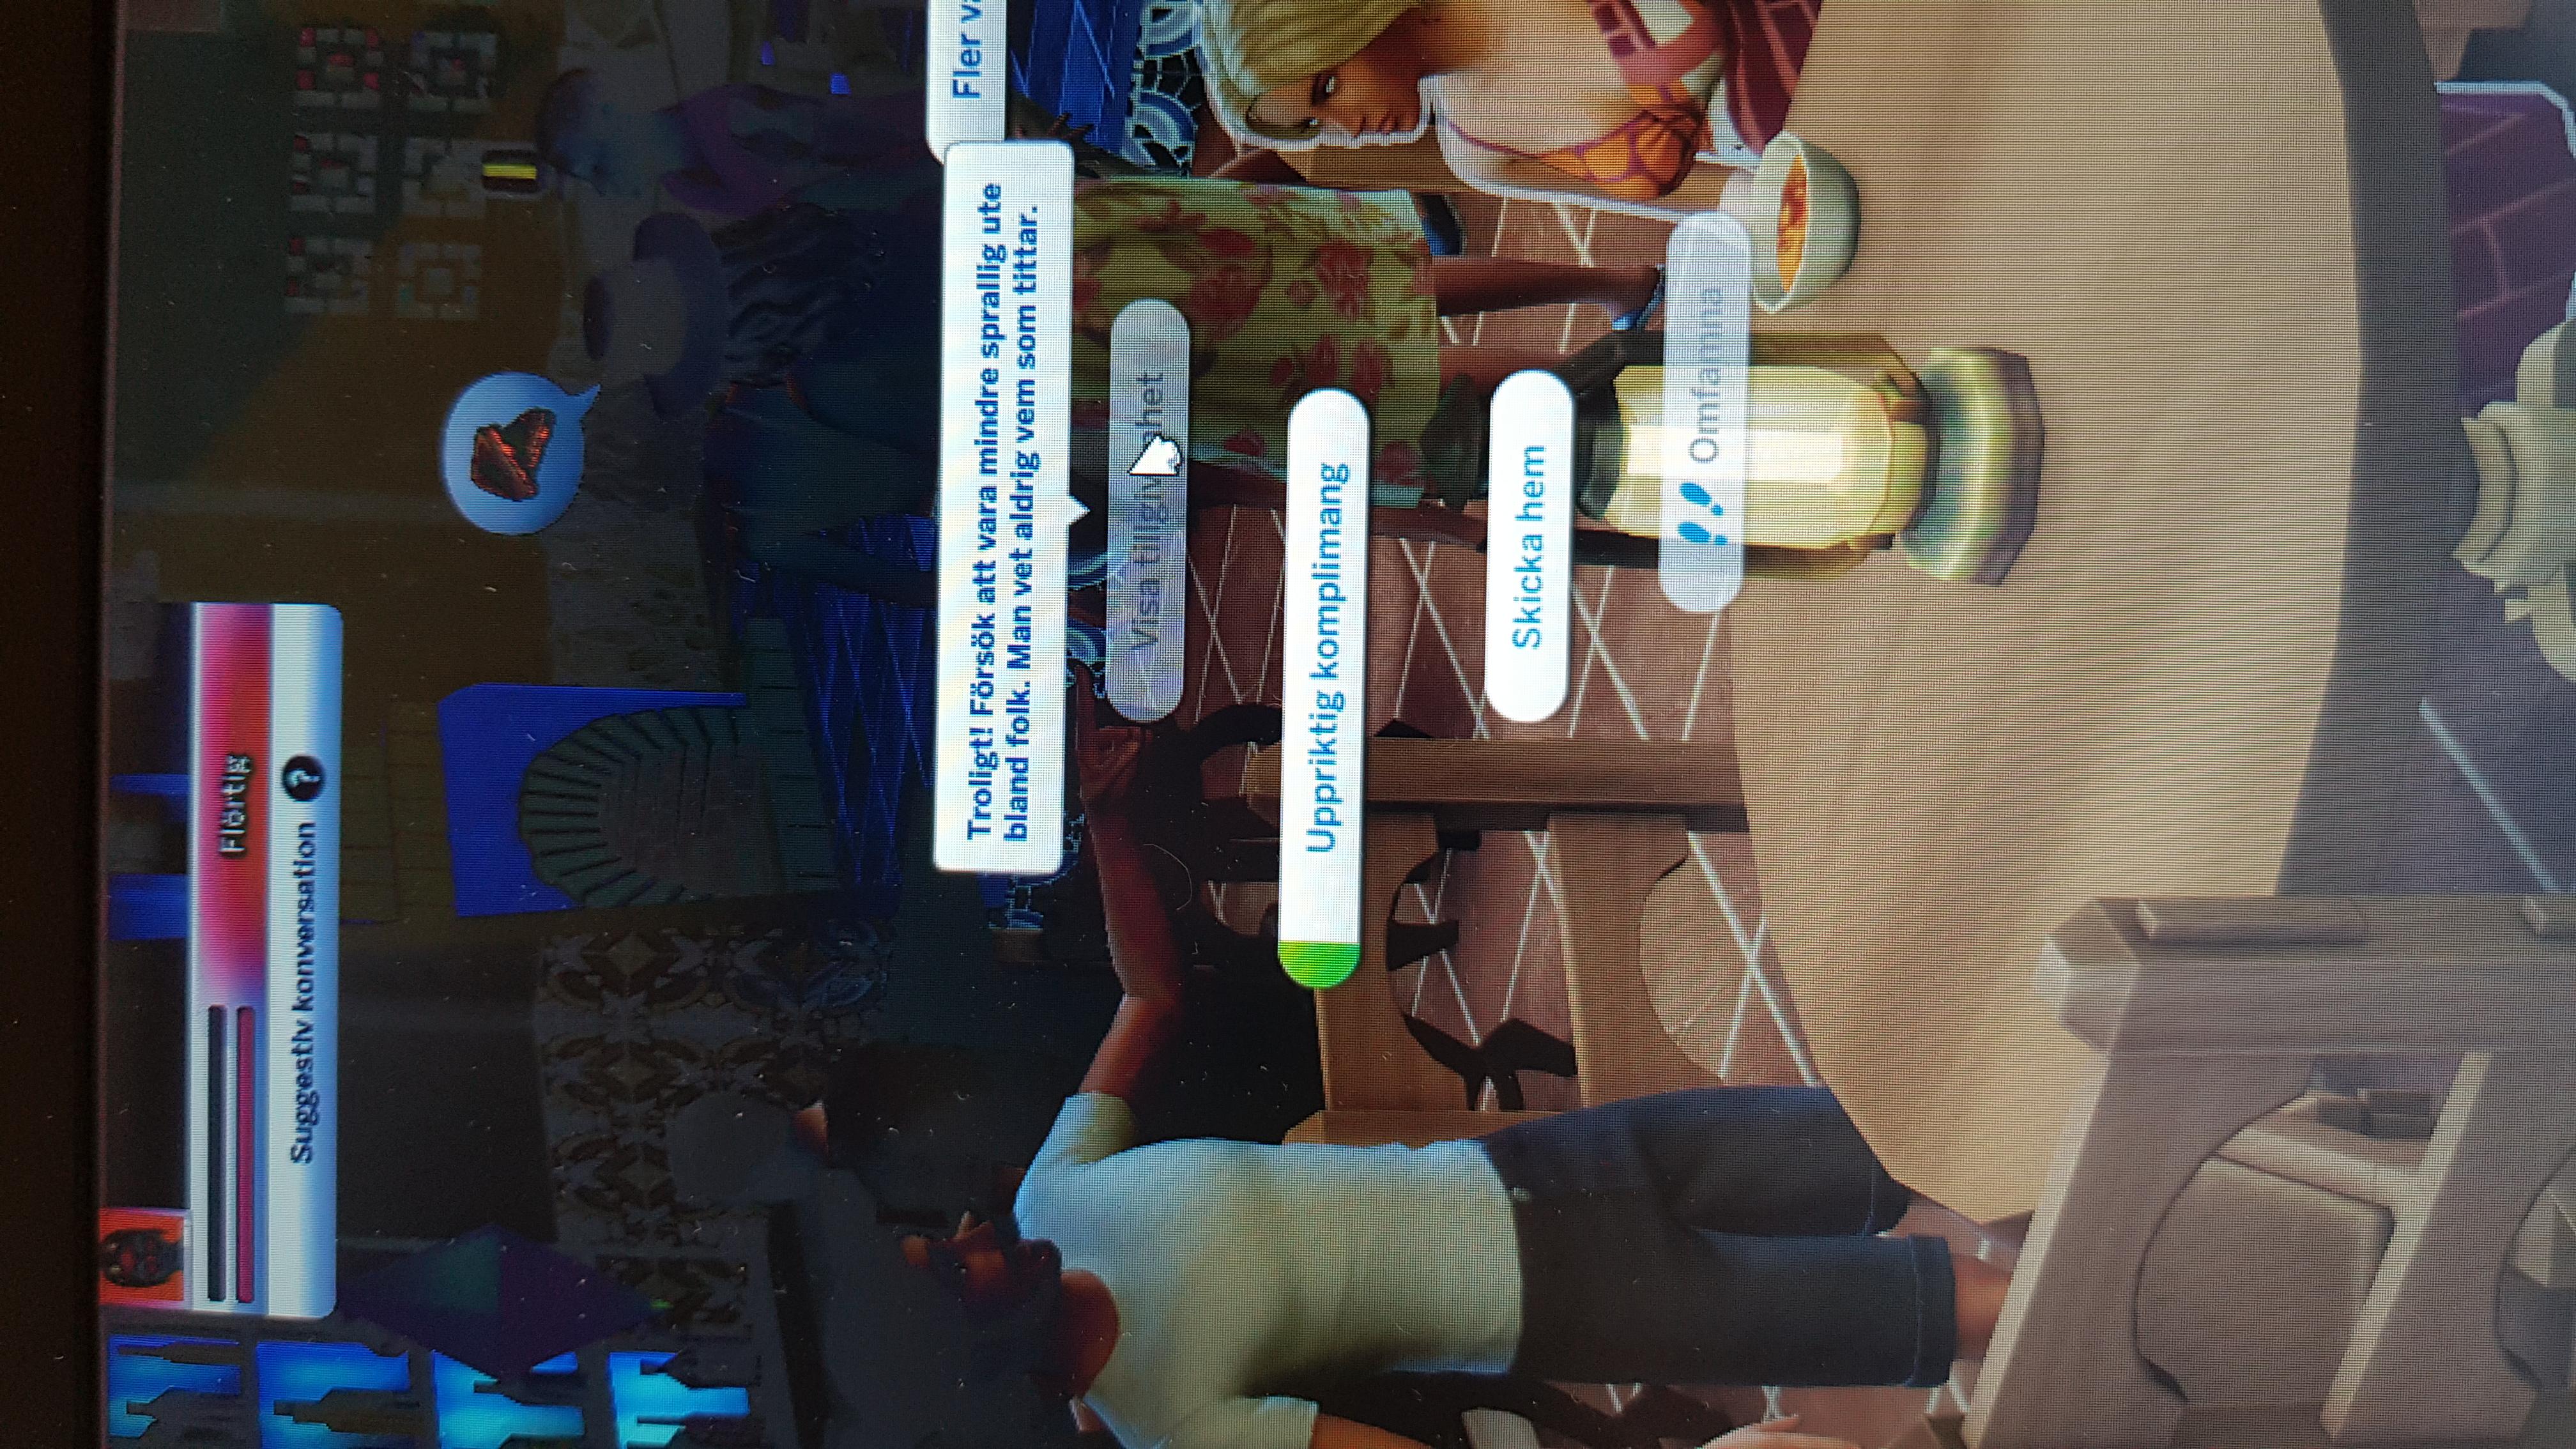 Sims 3 universitets dejting